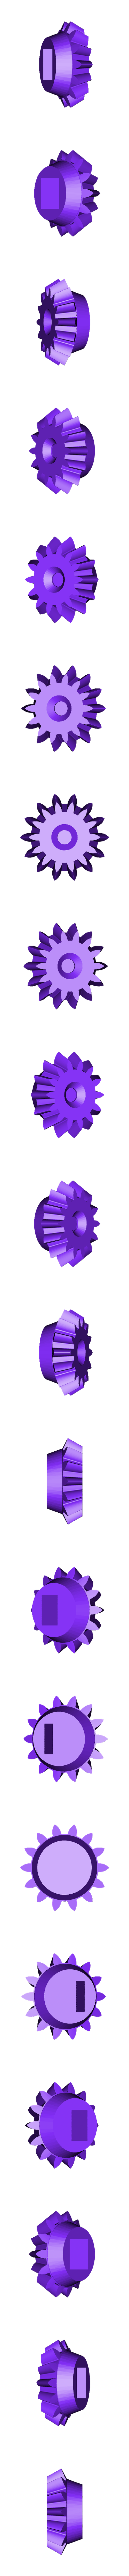 TruckV3_Axle2_rear_pinion_shaft.STL Download STL file 3D Printed RC Truck V3 • 3D print model, MrCrankyface